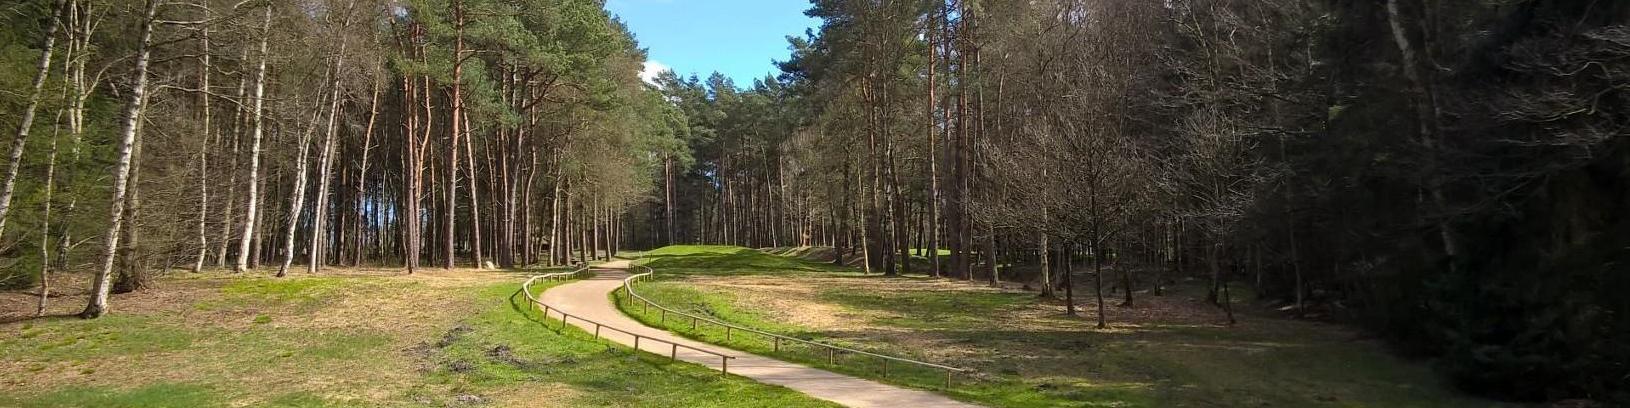 Golf-Weg HanseGrand